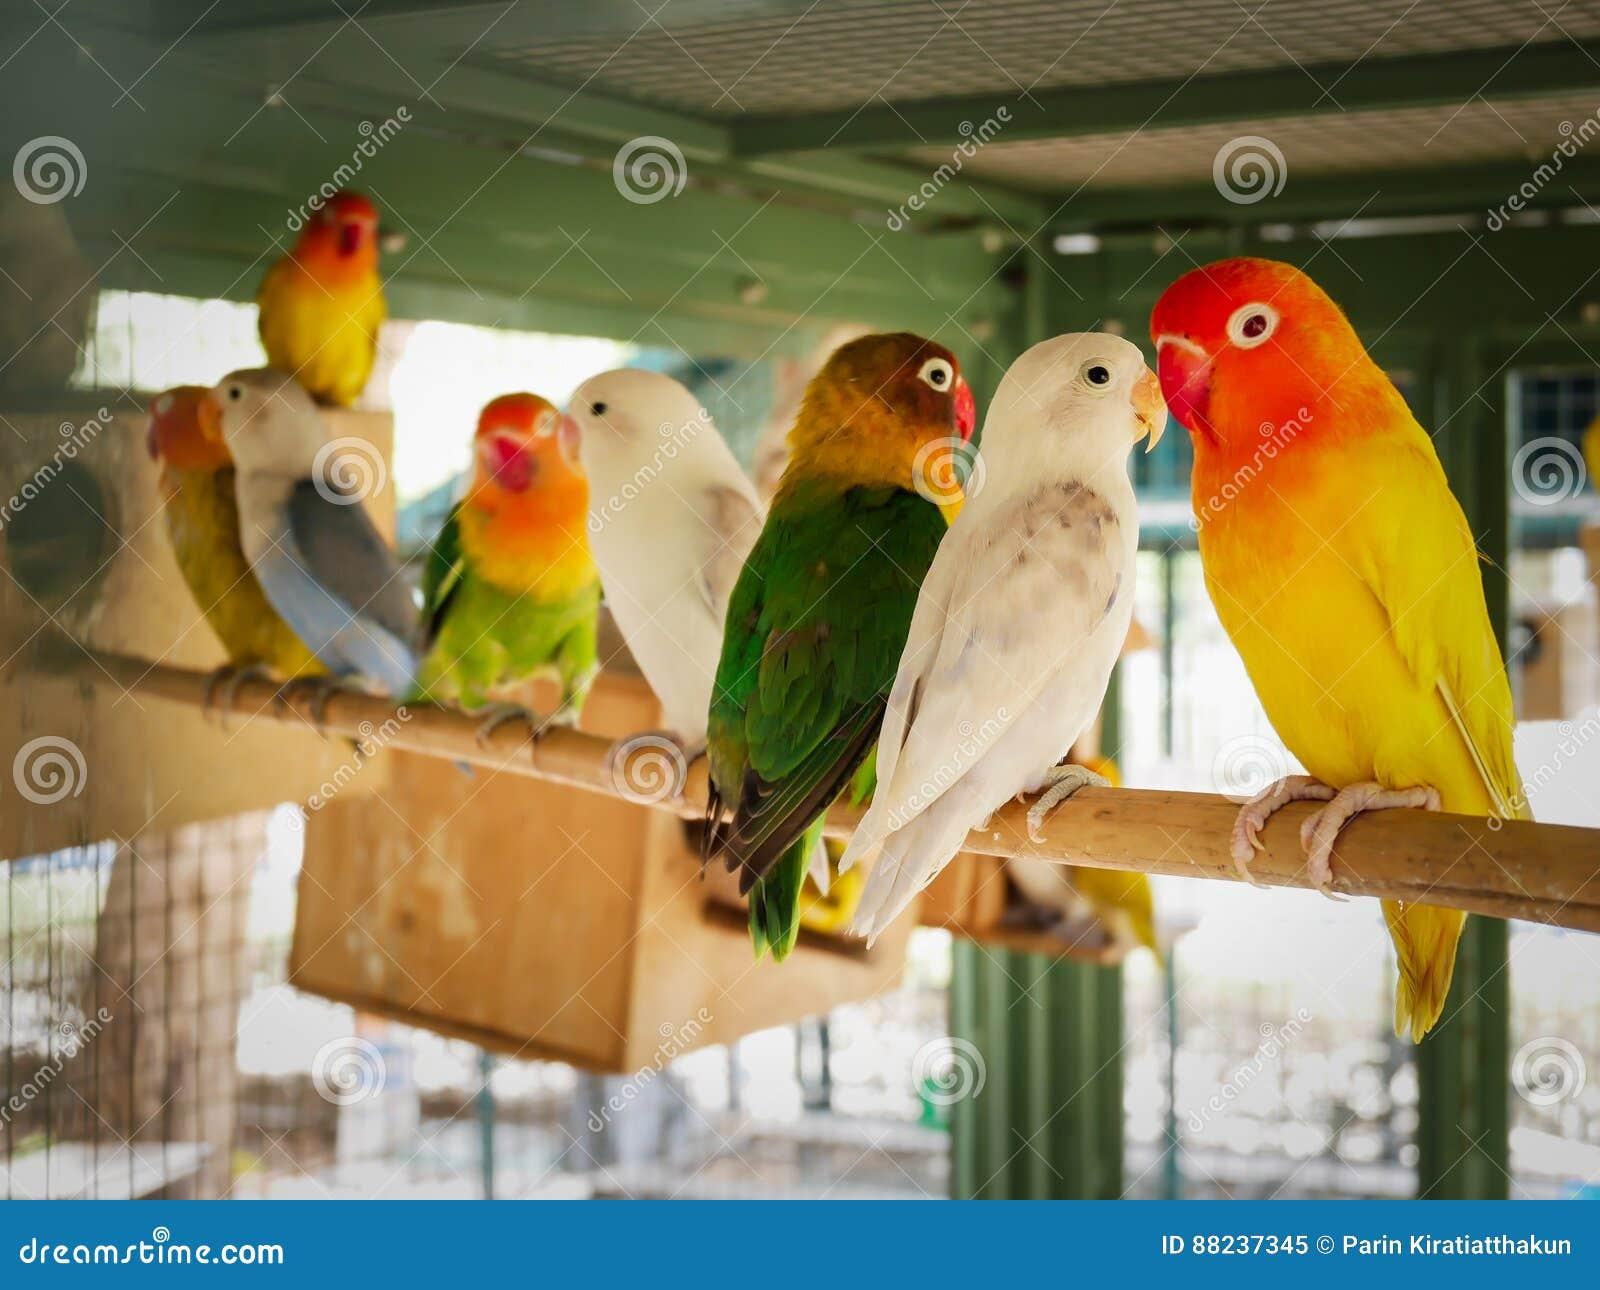 Beautiful Love Birds Stock Image Image Of Beak Green 88237345